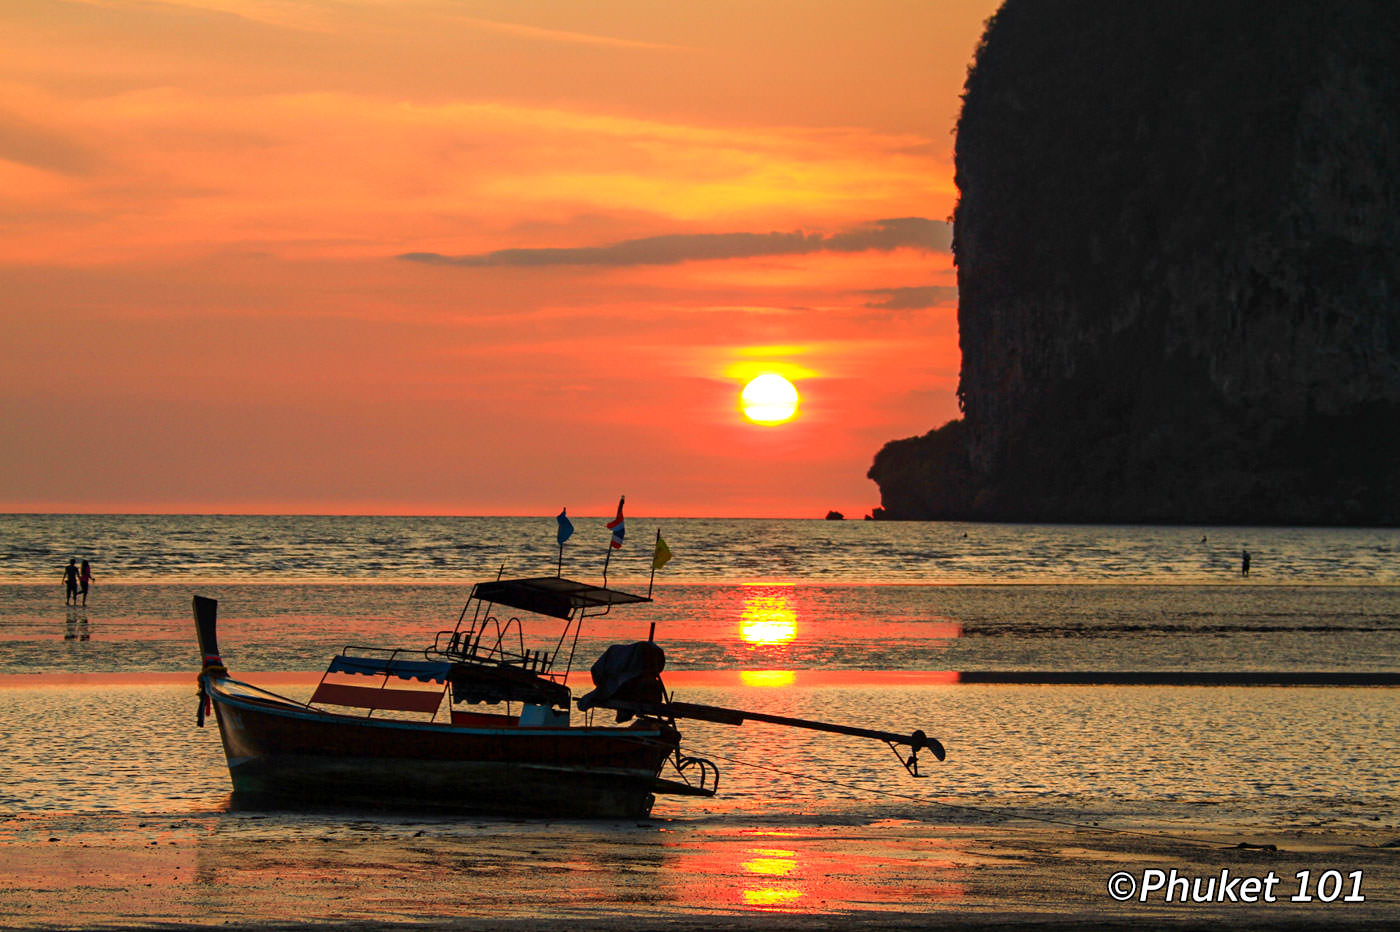 Phuket Sunset Photos